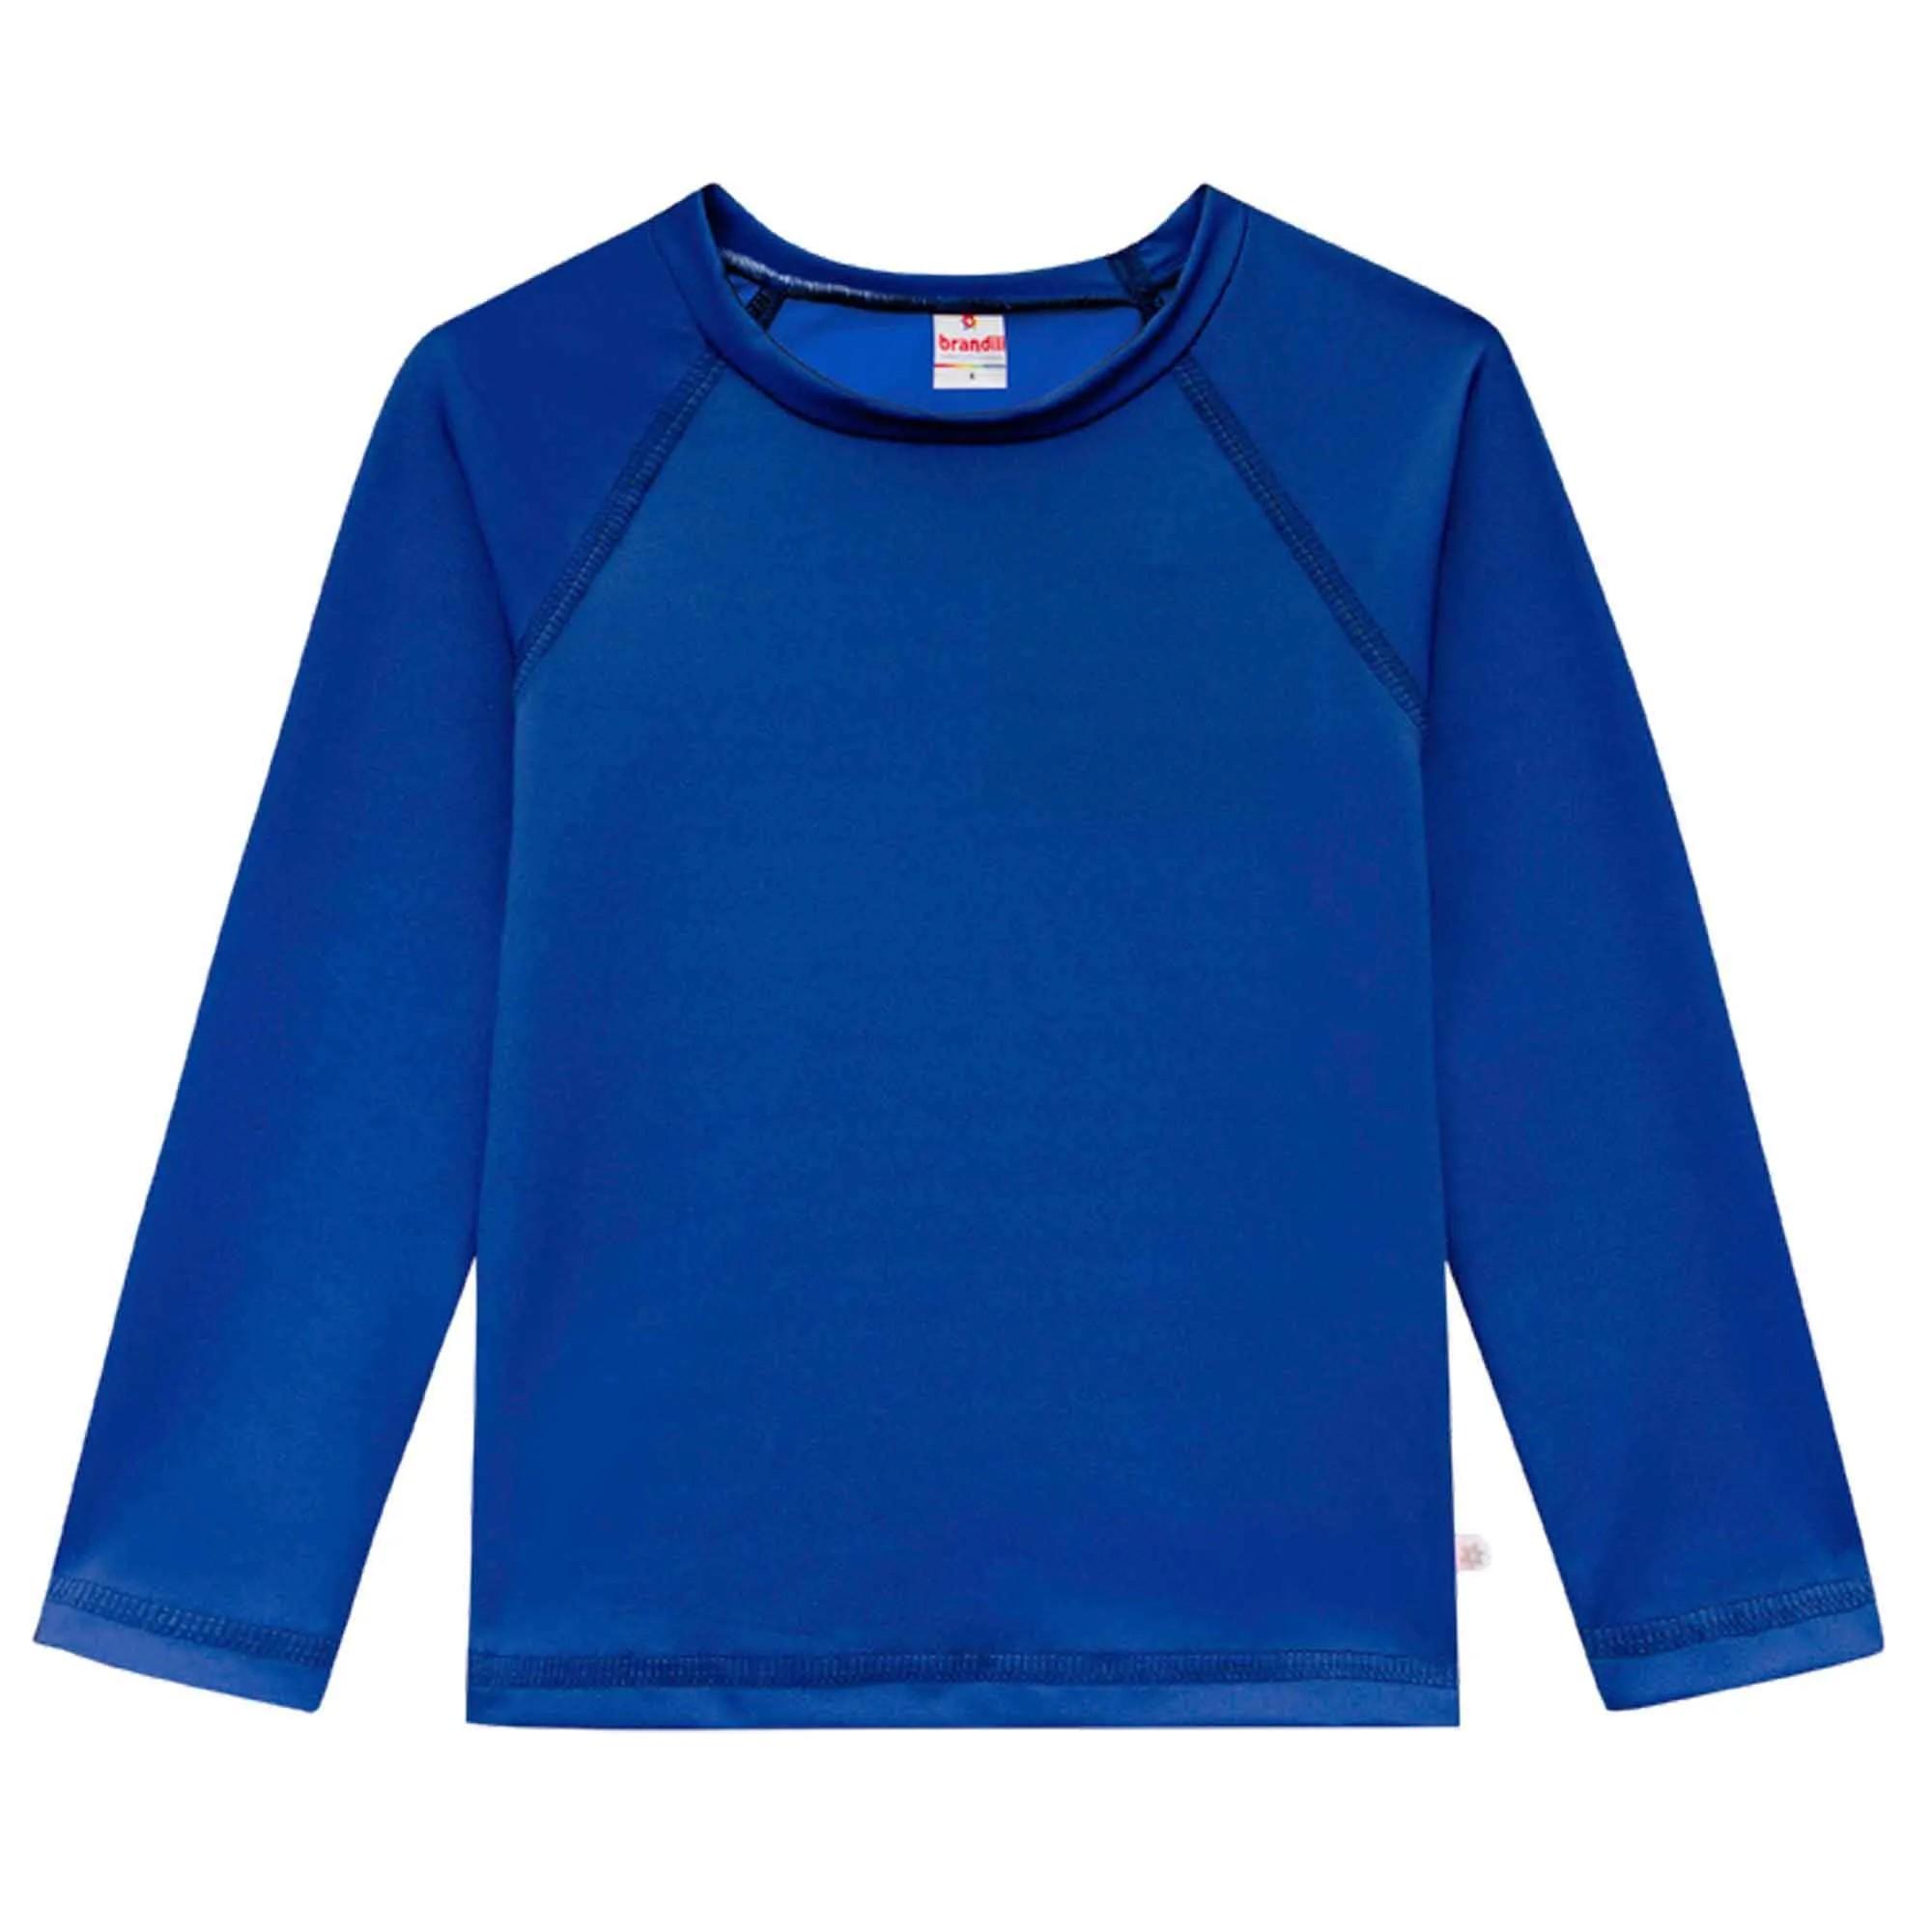 Camiseta Manga Longa Brandili - Malha UV - 1 ao 3